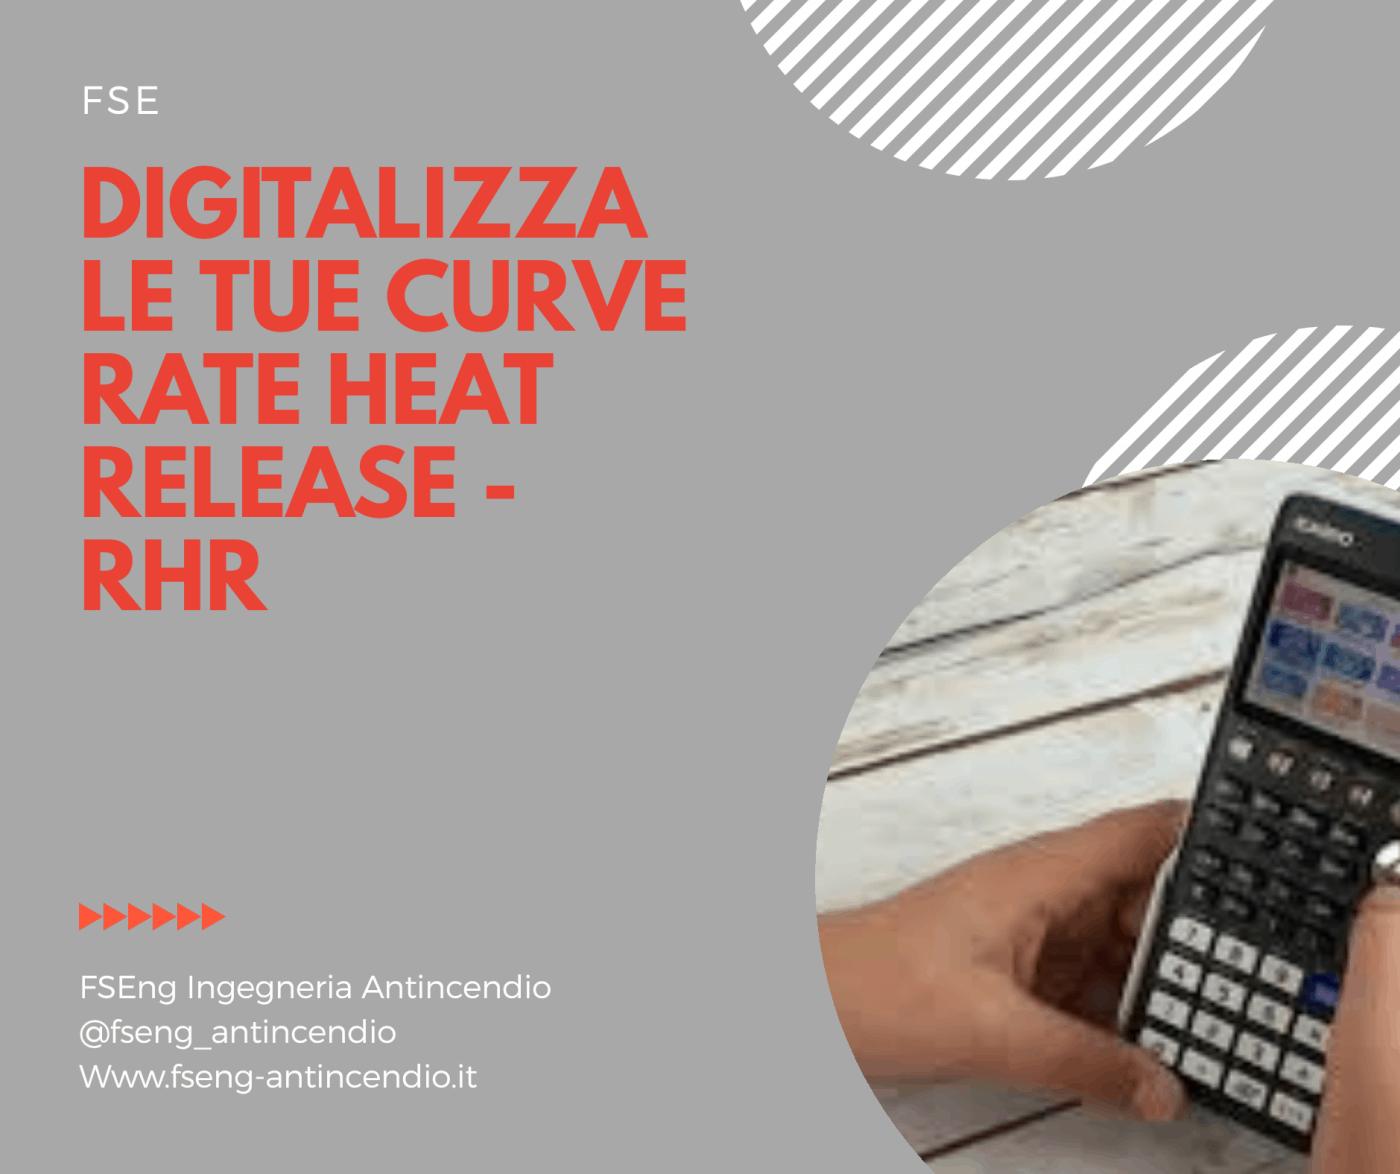 Calcolatrice di curva rete heat release rhr fse